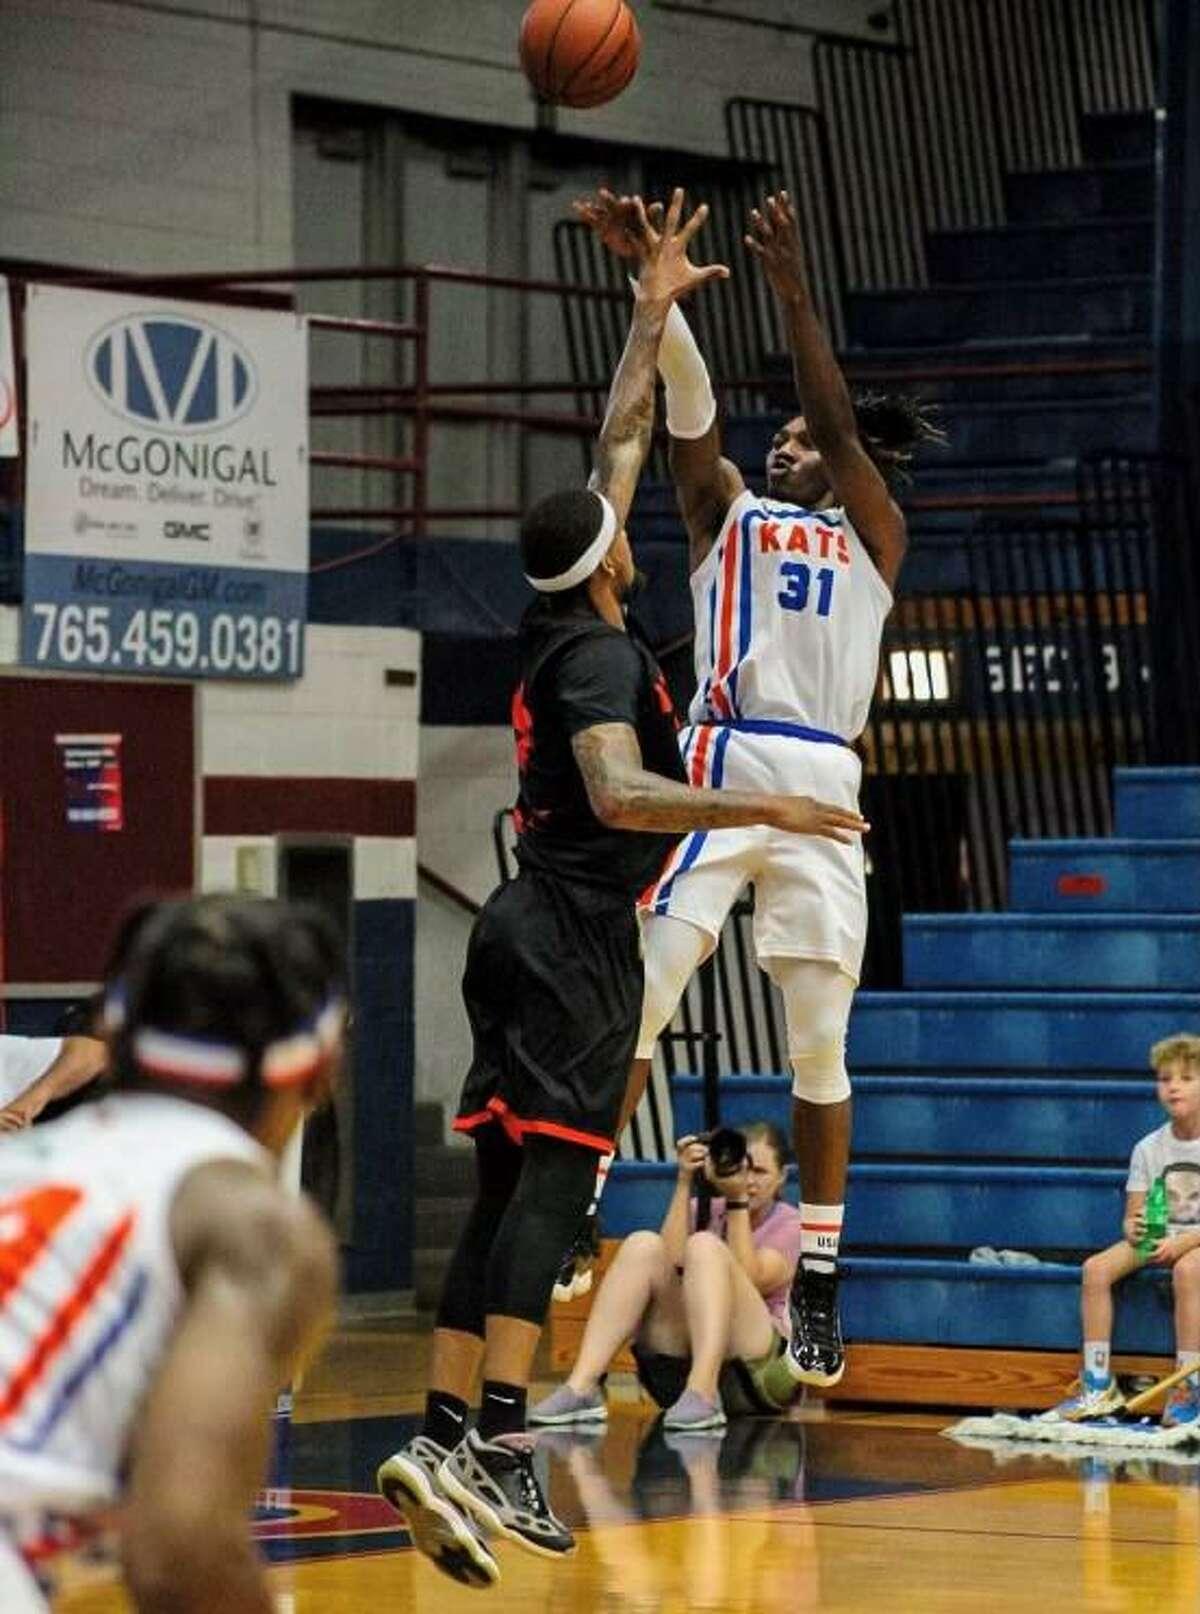 Kokomo BobKats basketball player Tremont Moore.